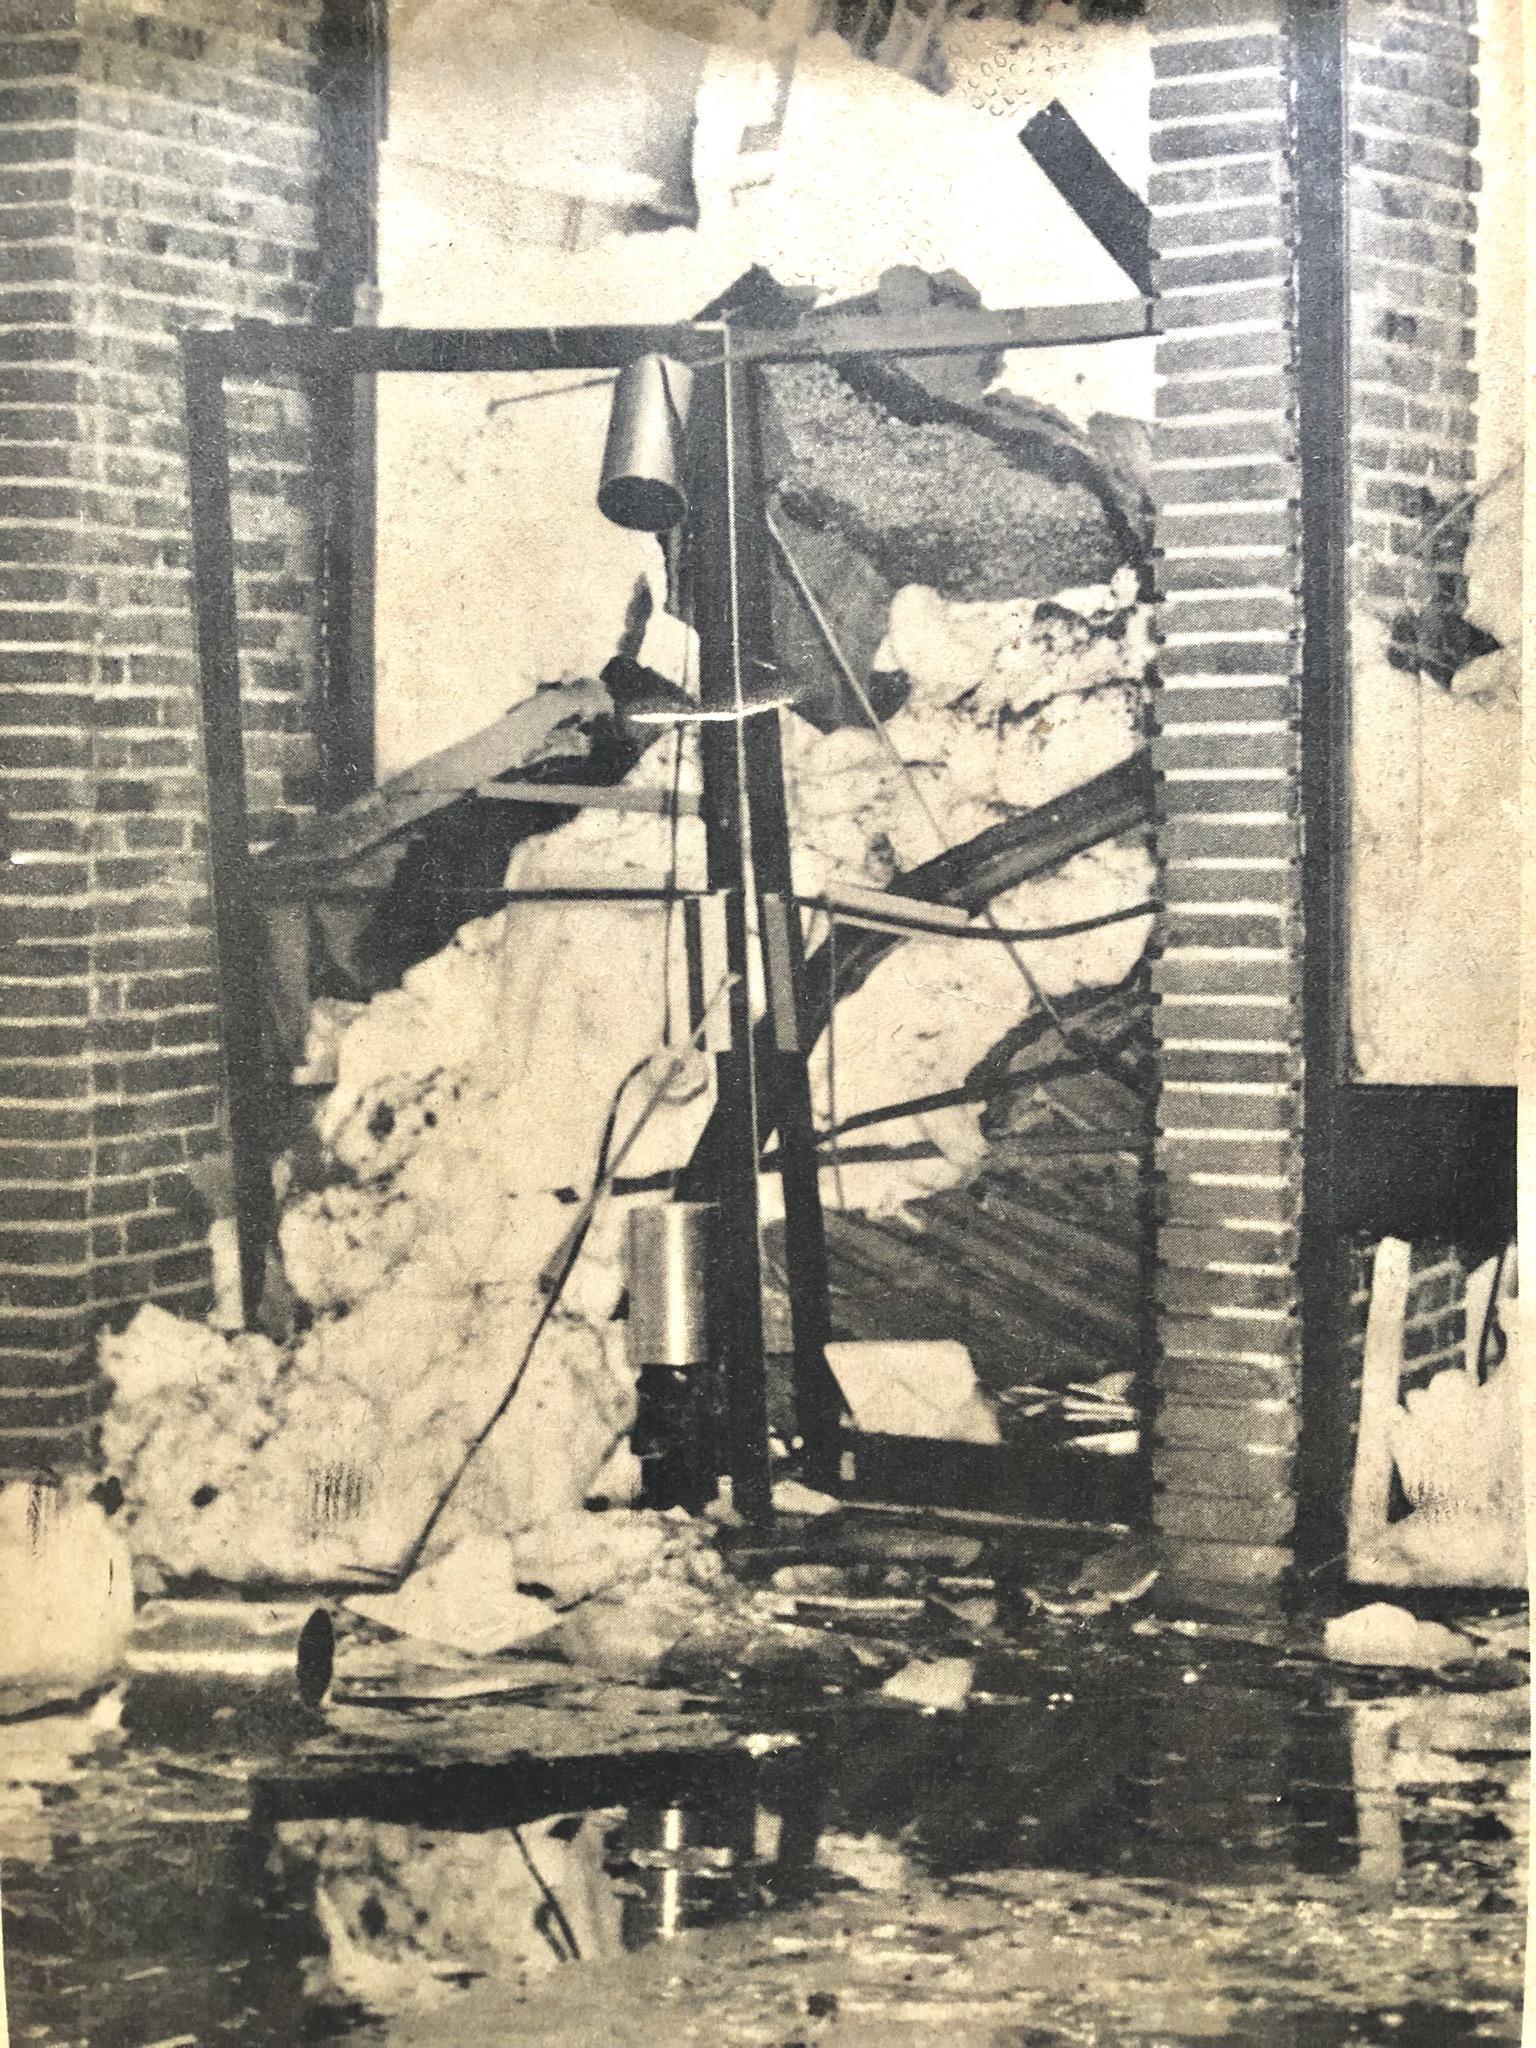 SportsWorld Burlington Mall collapse